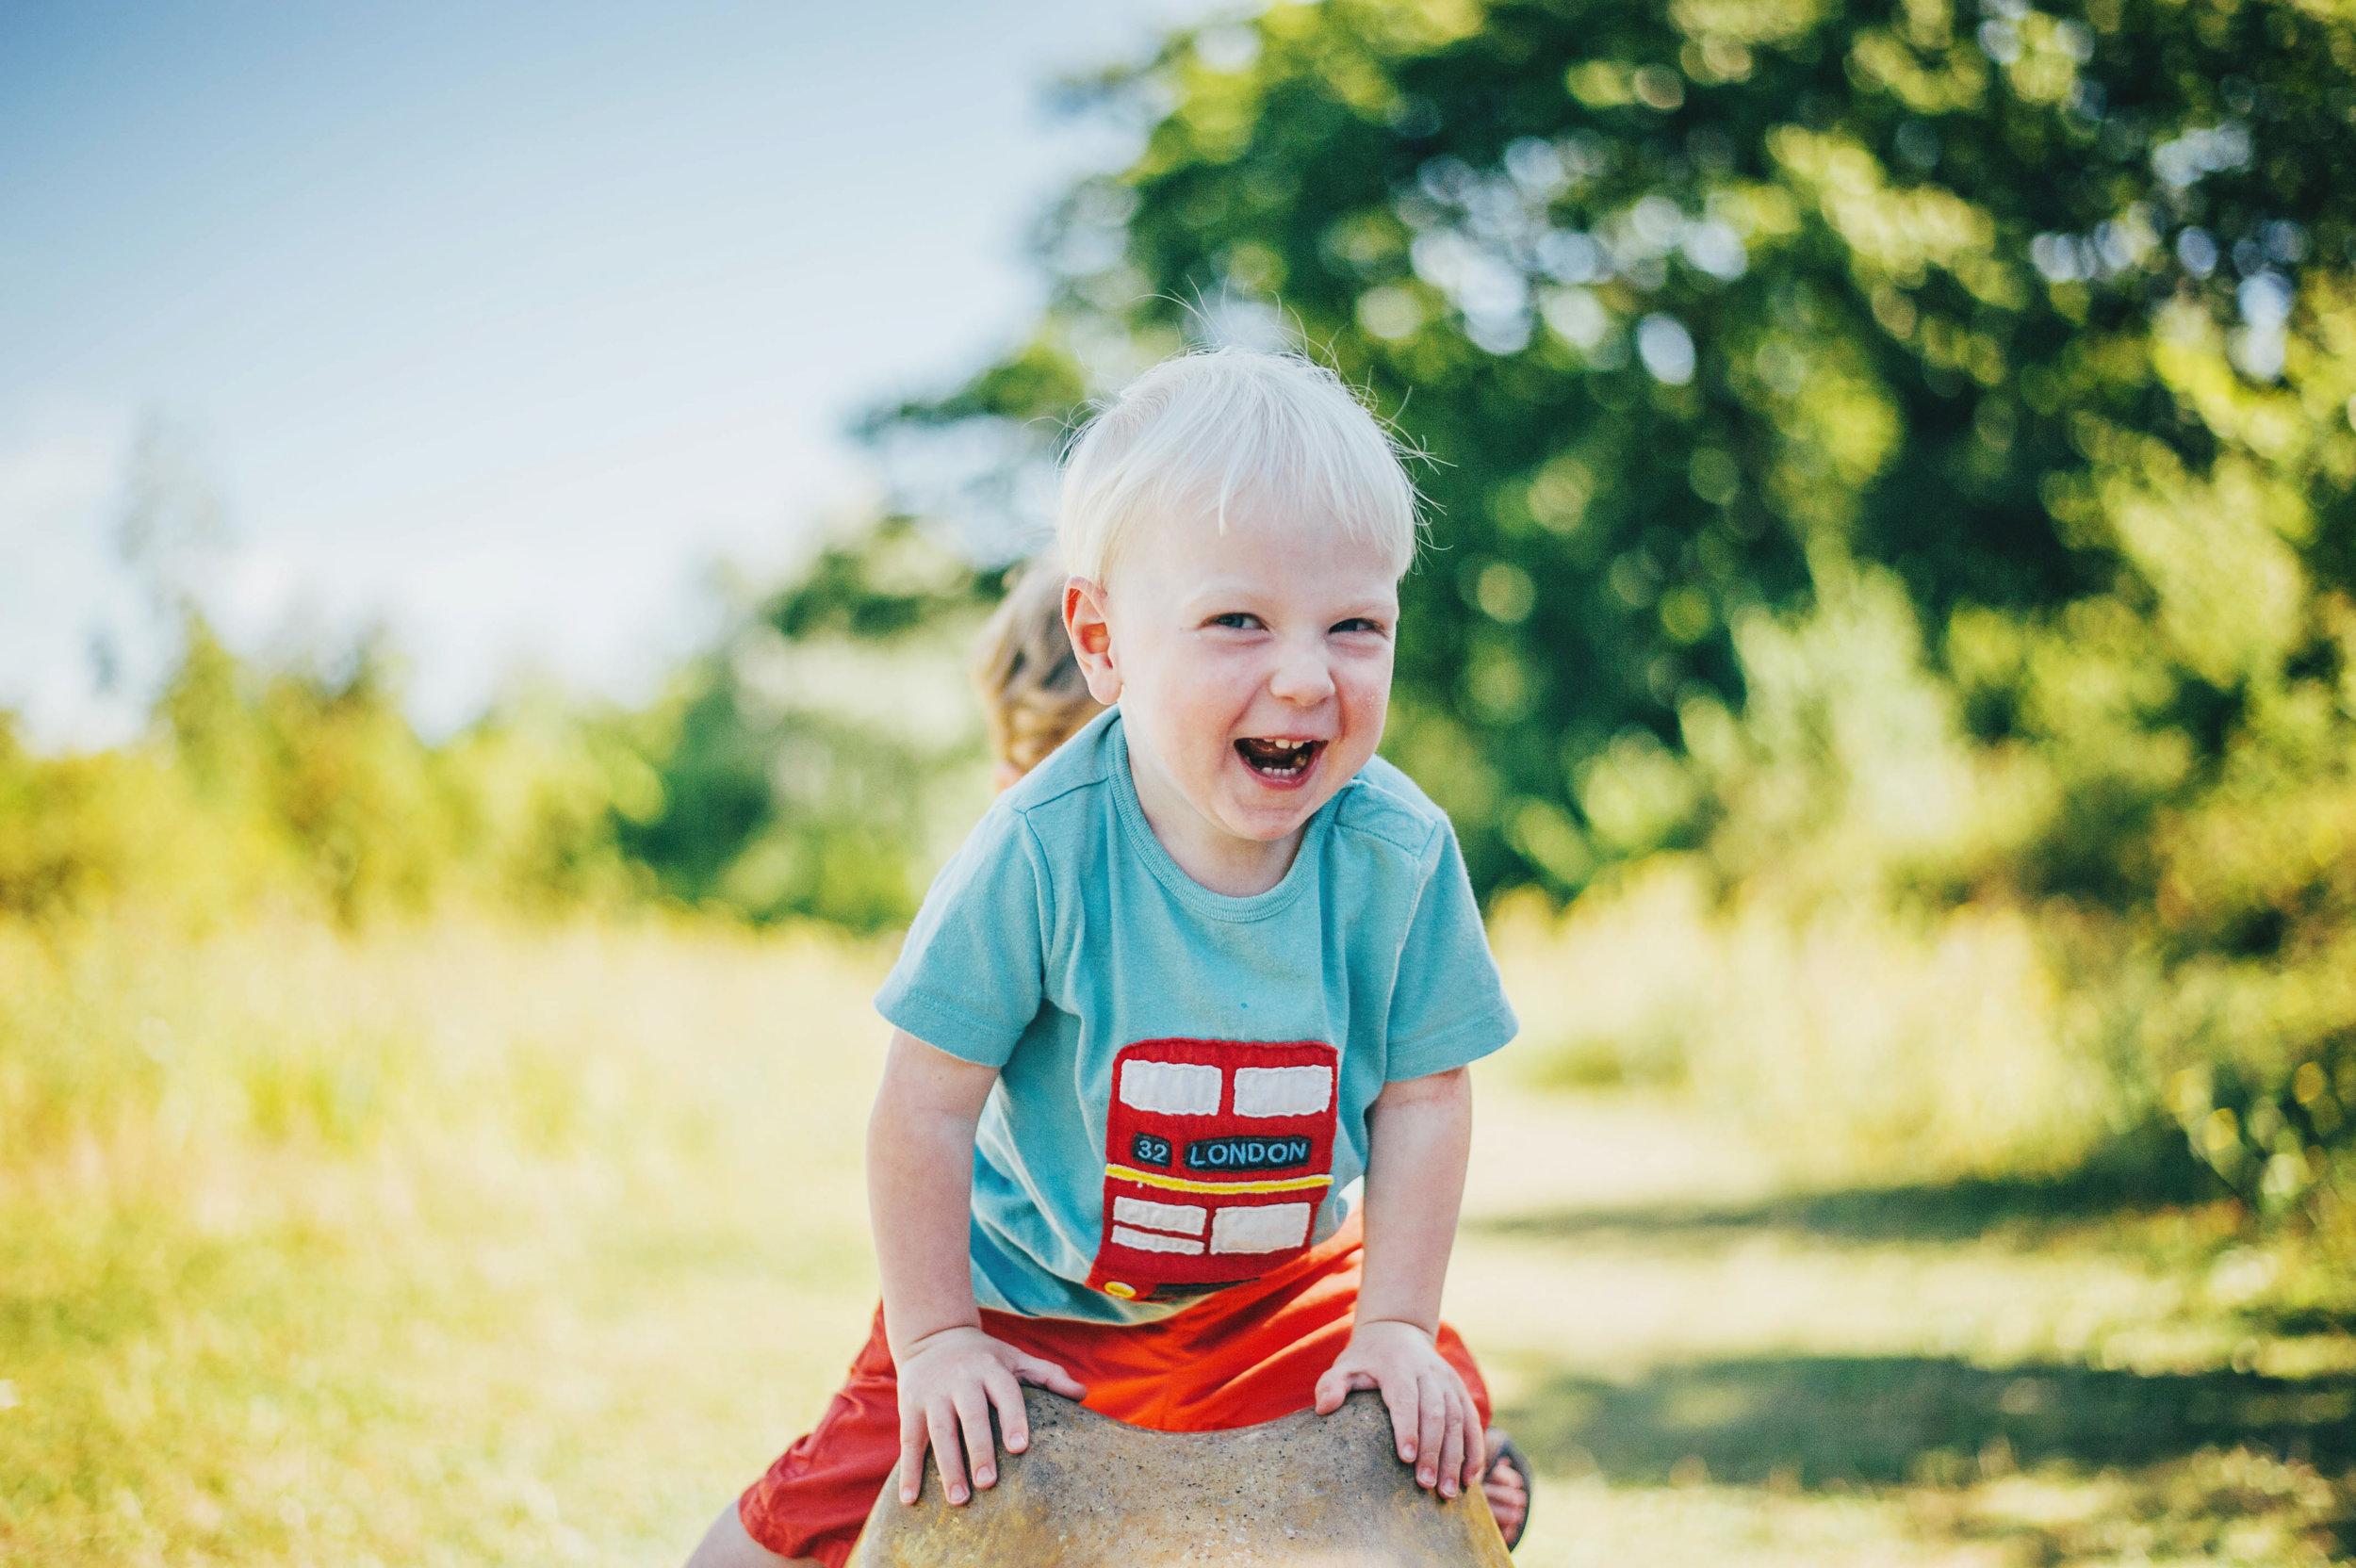 Little boy laughs in park Essex UK Documentary Portrait Photographer